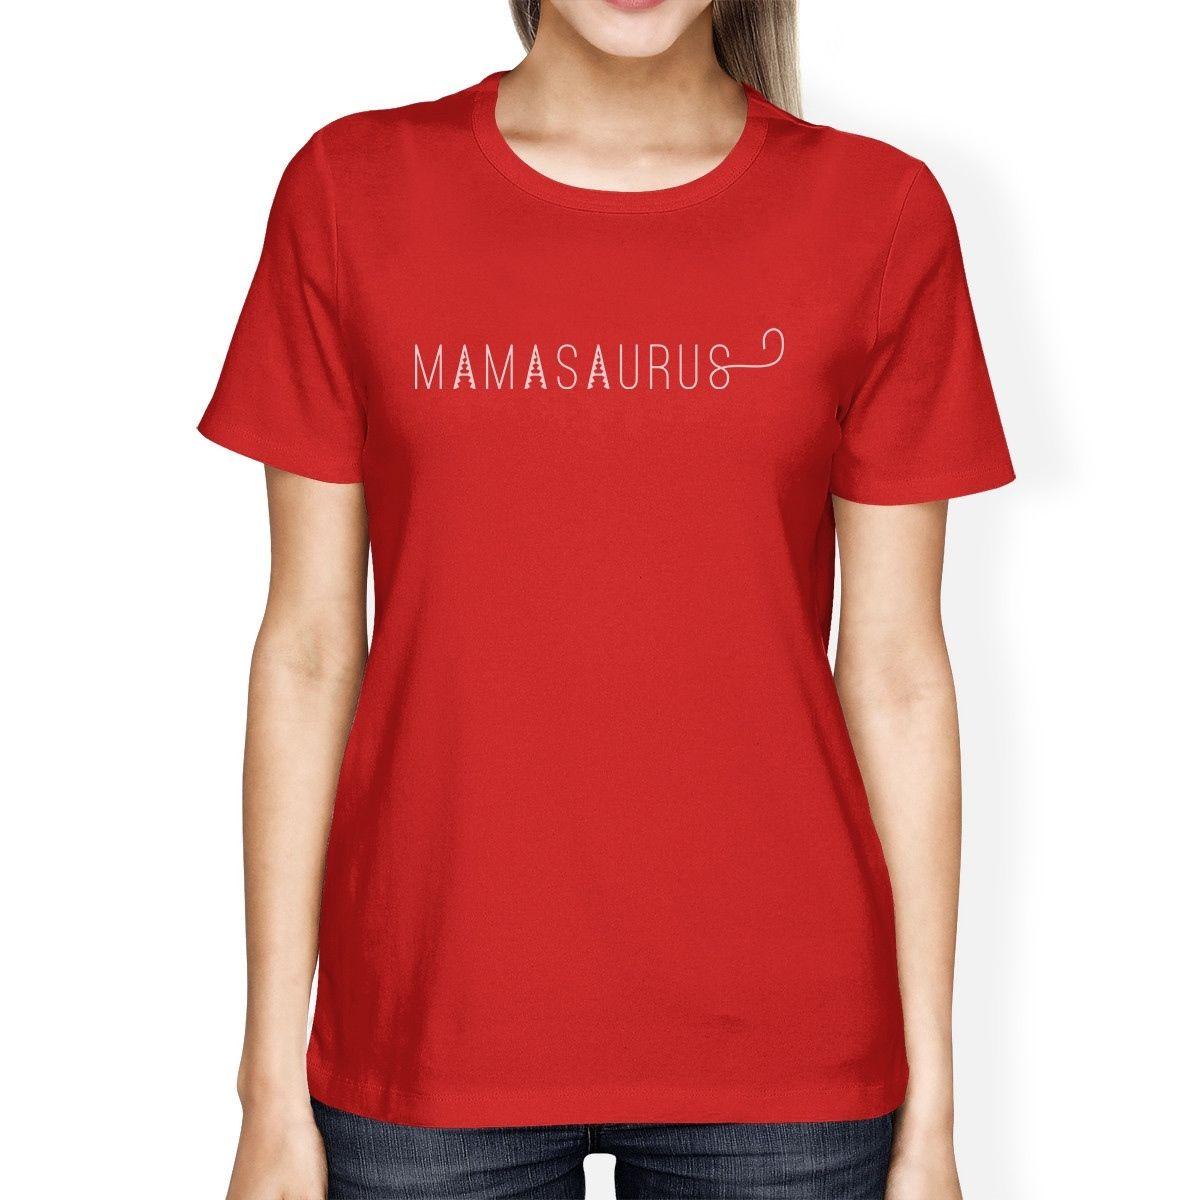 Desain t shirt unik - Mamasaurus Perempuan Merah Lengan Pendek Katun T Shirt Unik Desain T Shirt Murah Grosir Lady S T